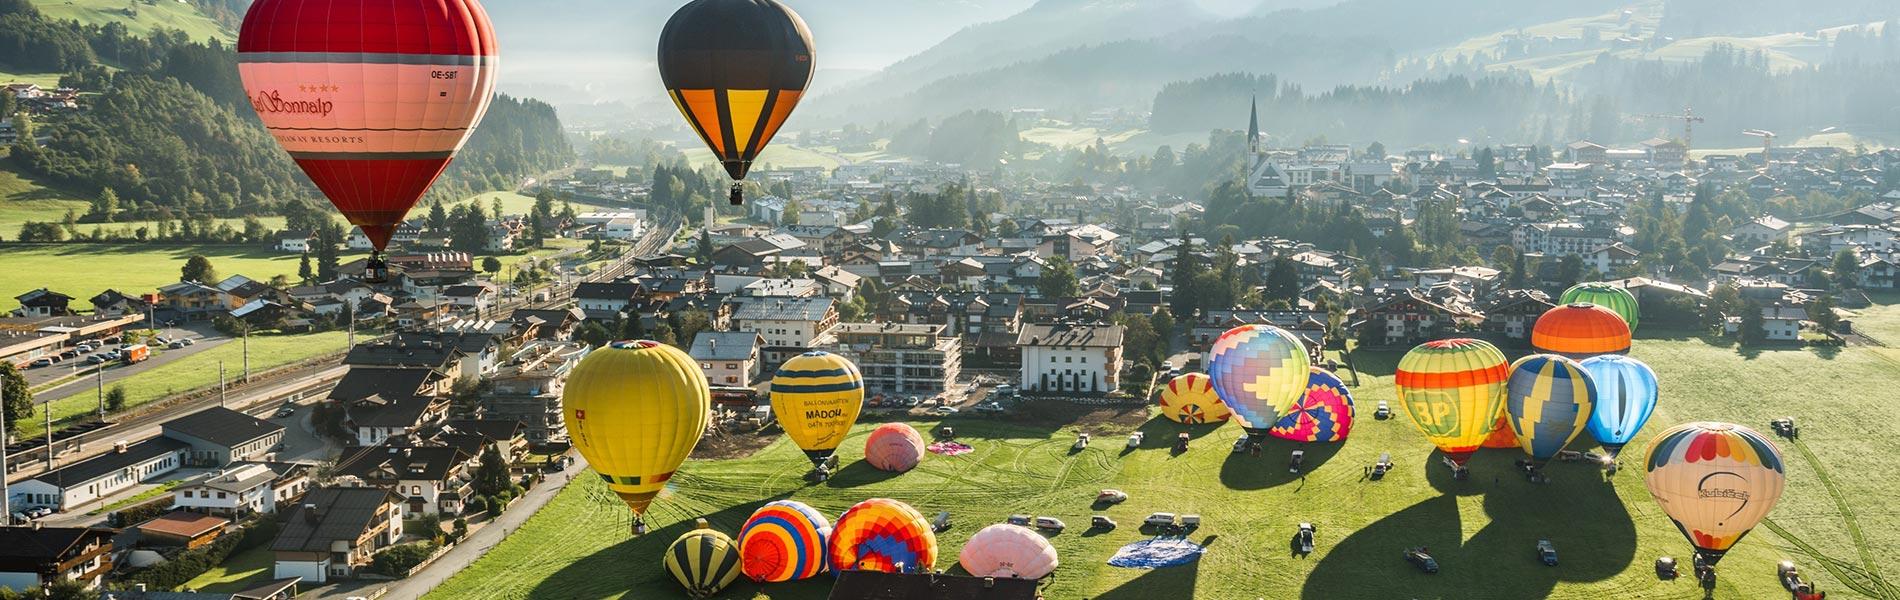 Incentives und Rahmenprogramme Hotel Rosengarten 5 Sterne Hotel Relais & Châteaux Hotel Kirchberg Tirol Austria